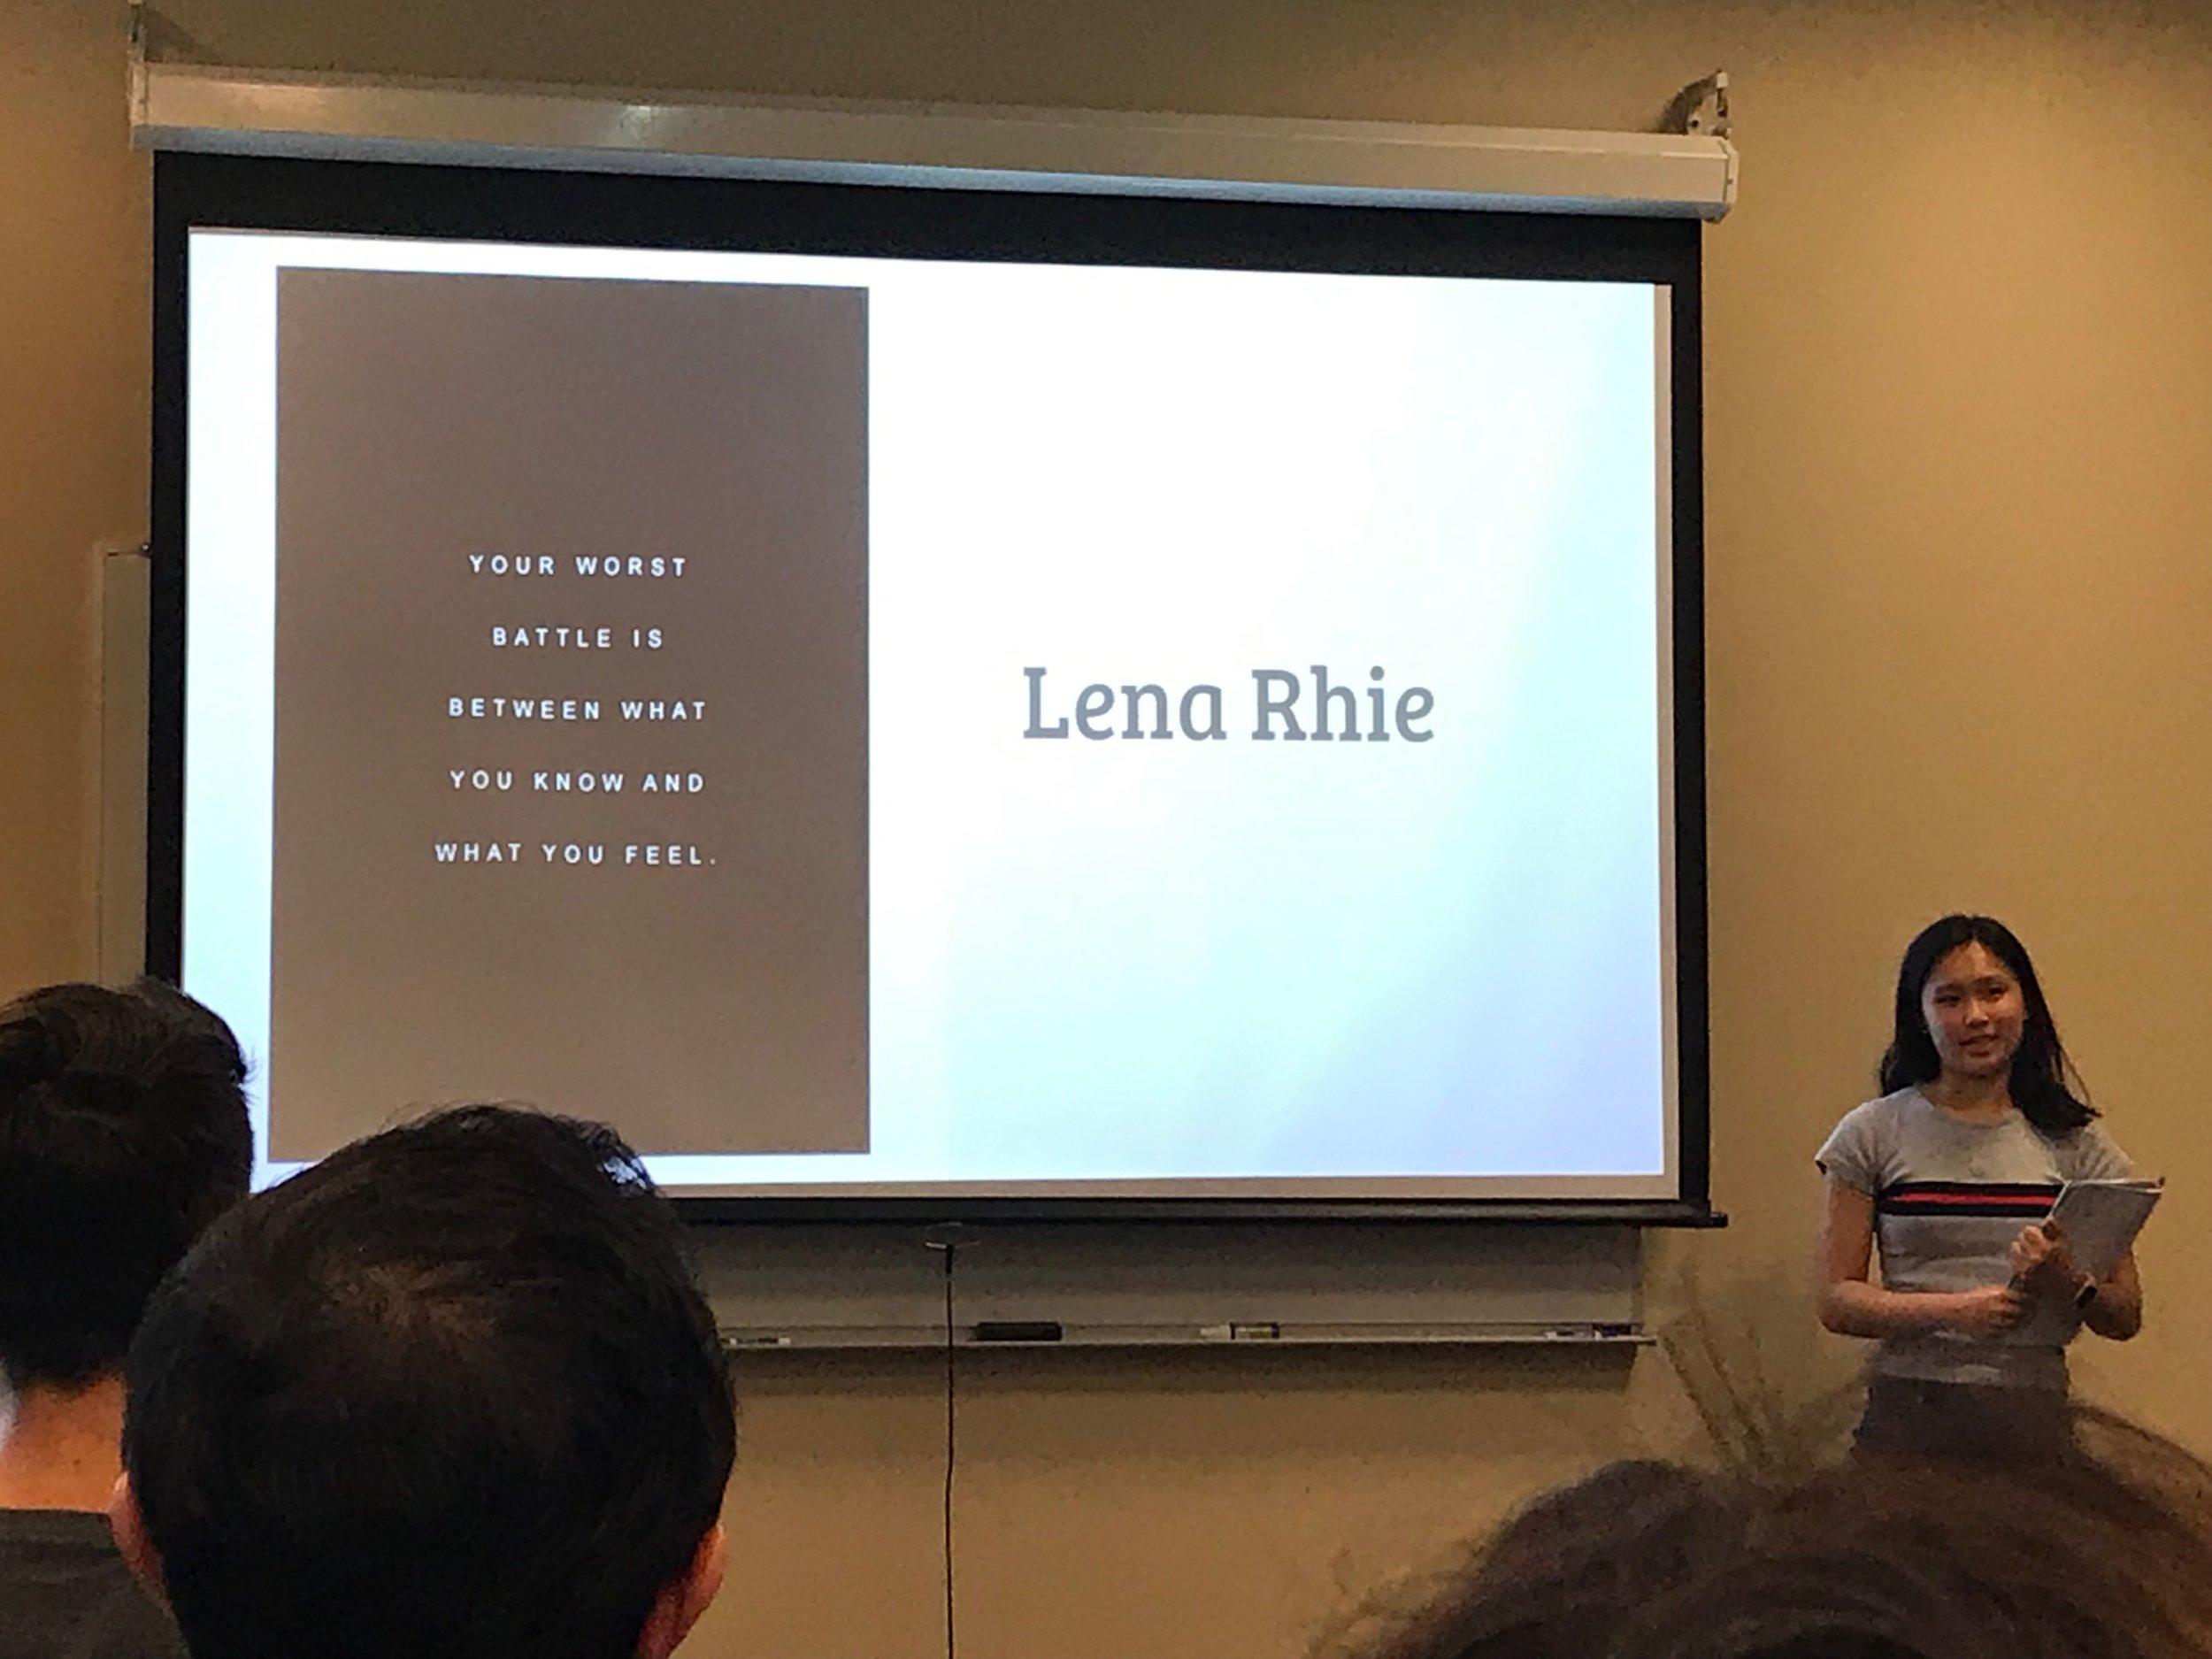 Lena Rhie presents her PechaKucha moment.